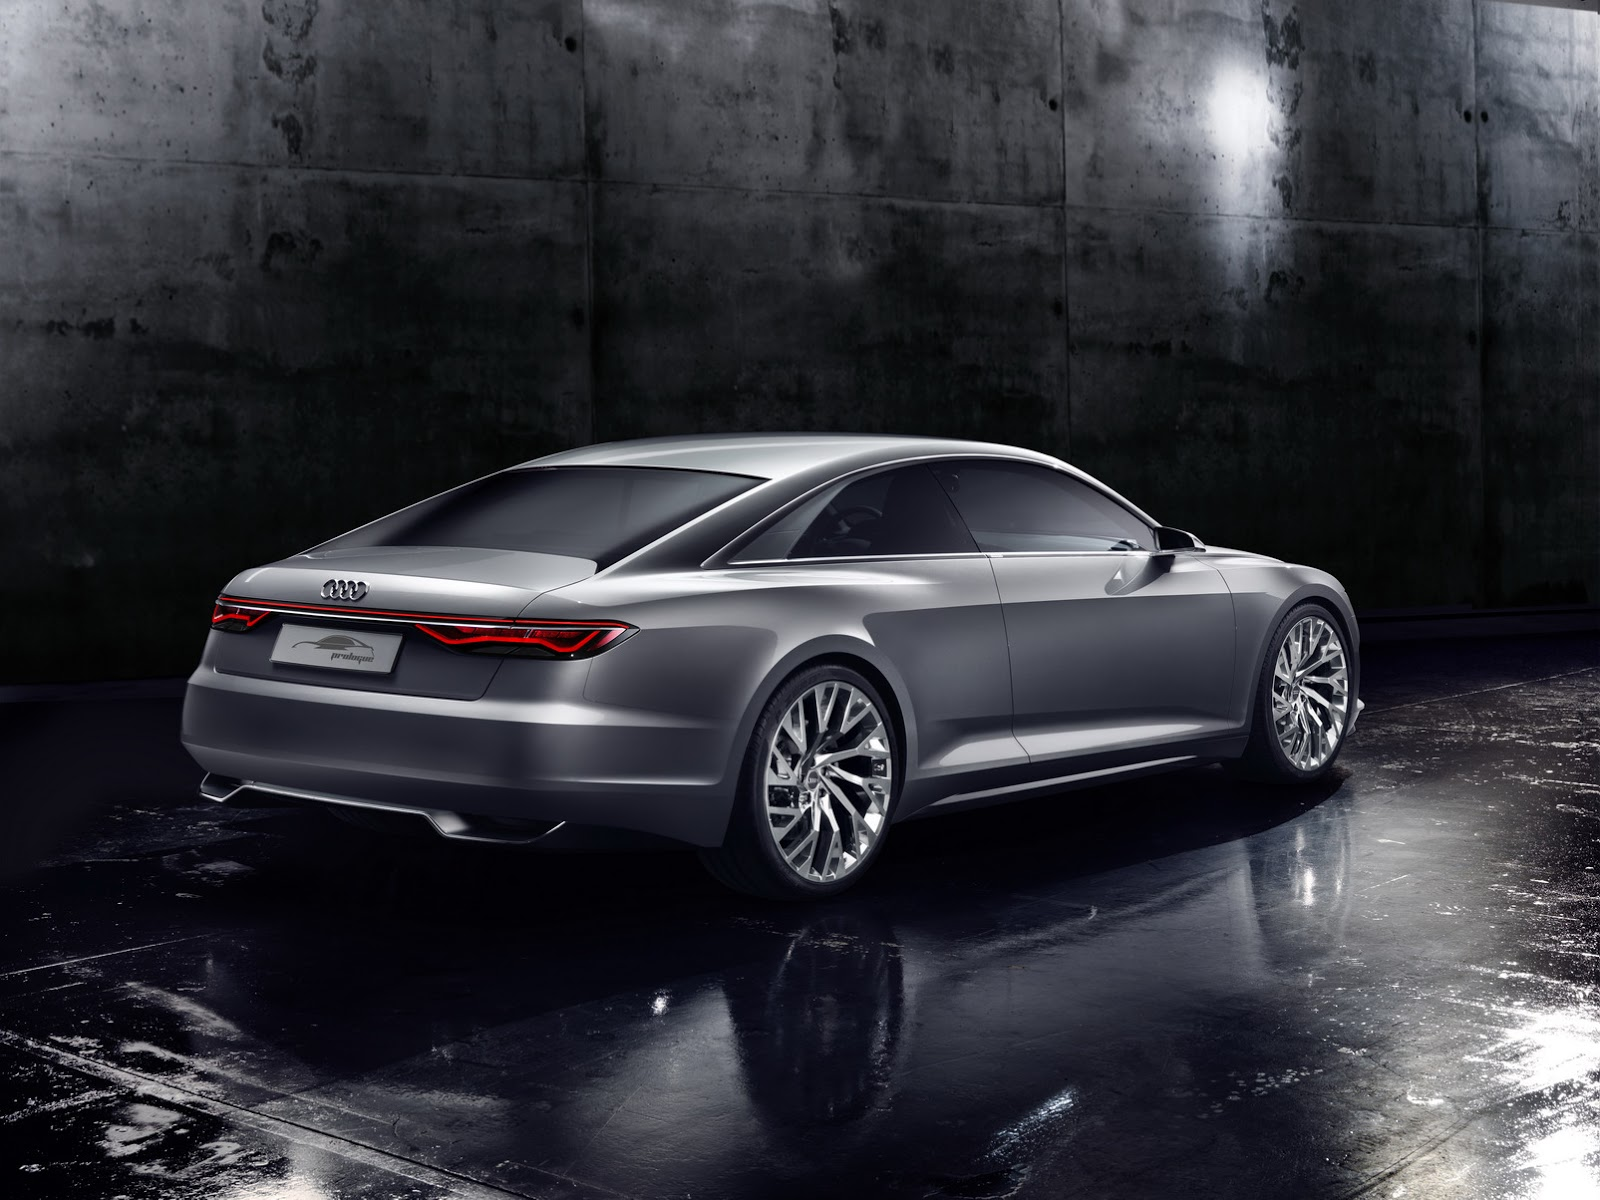 Audi Prologue Coupe Concept is Ingolstadt's S-Class Coupe